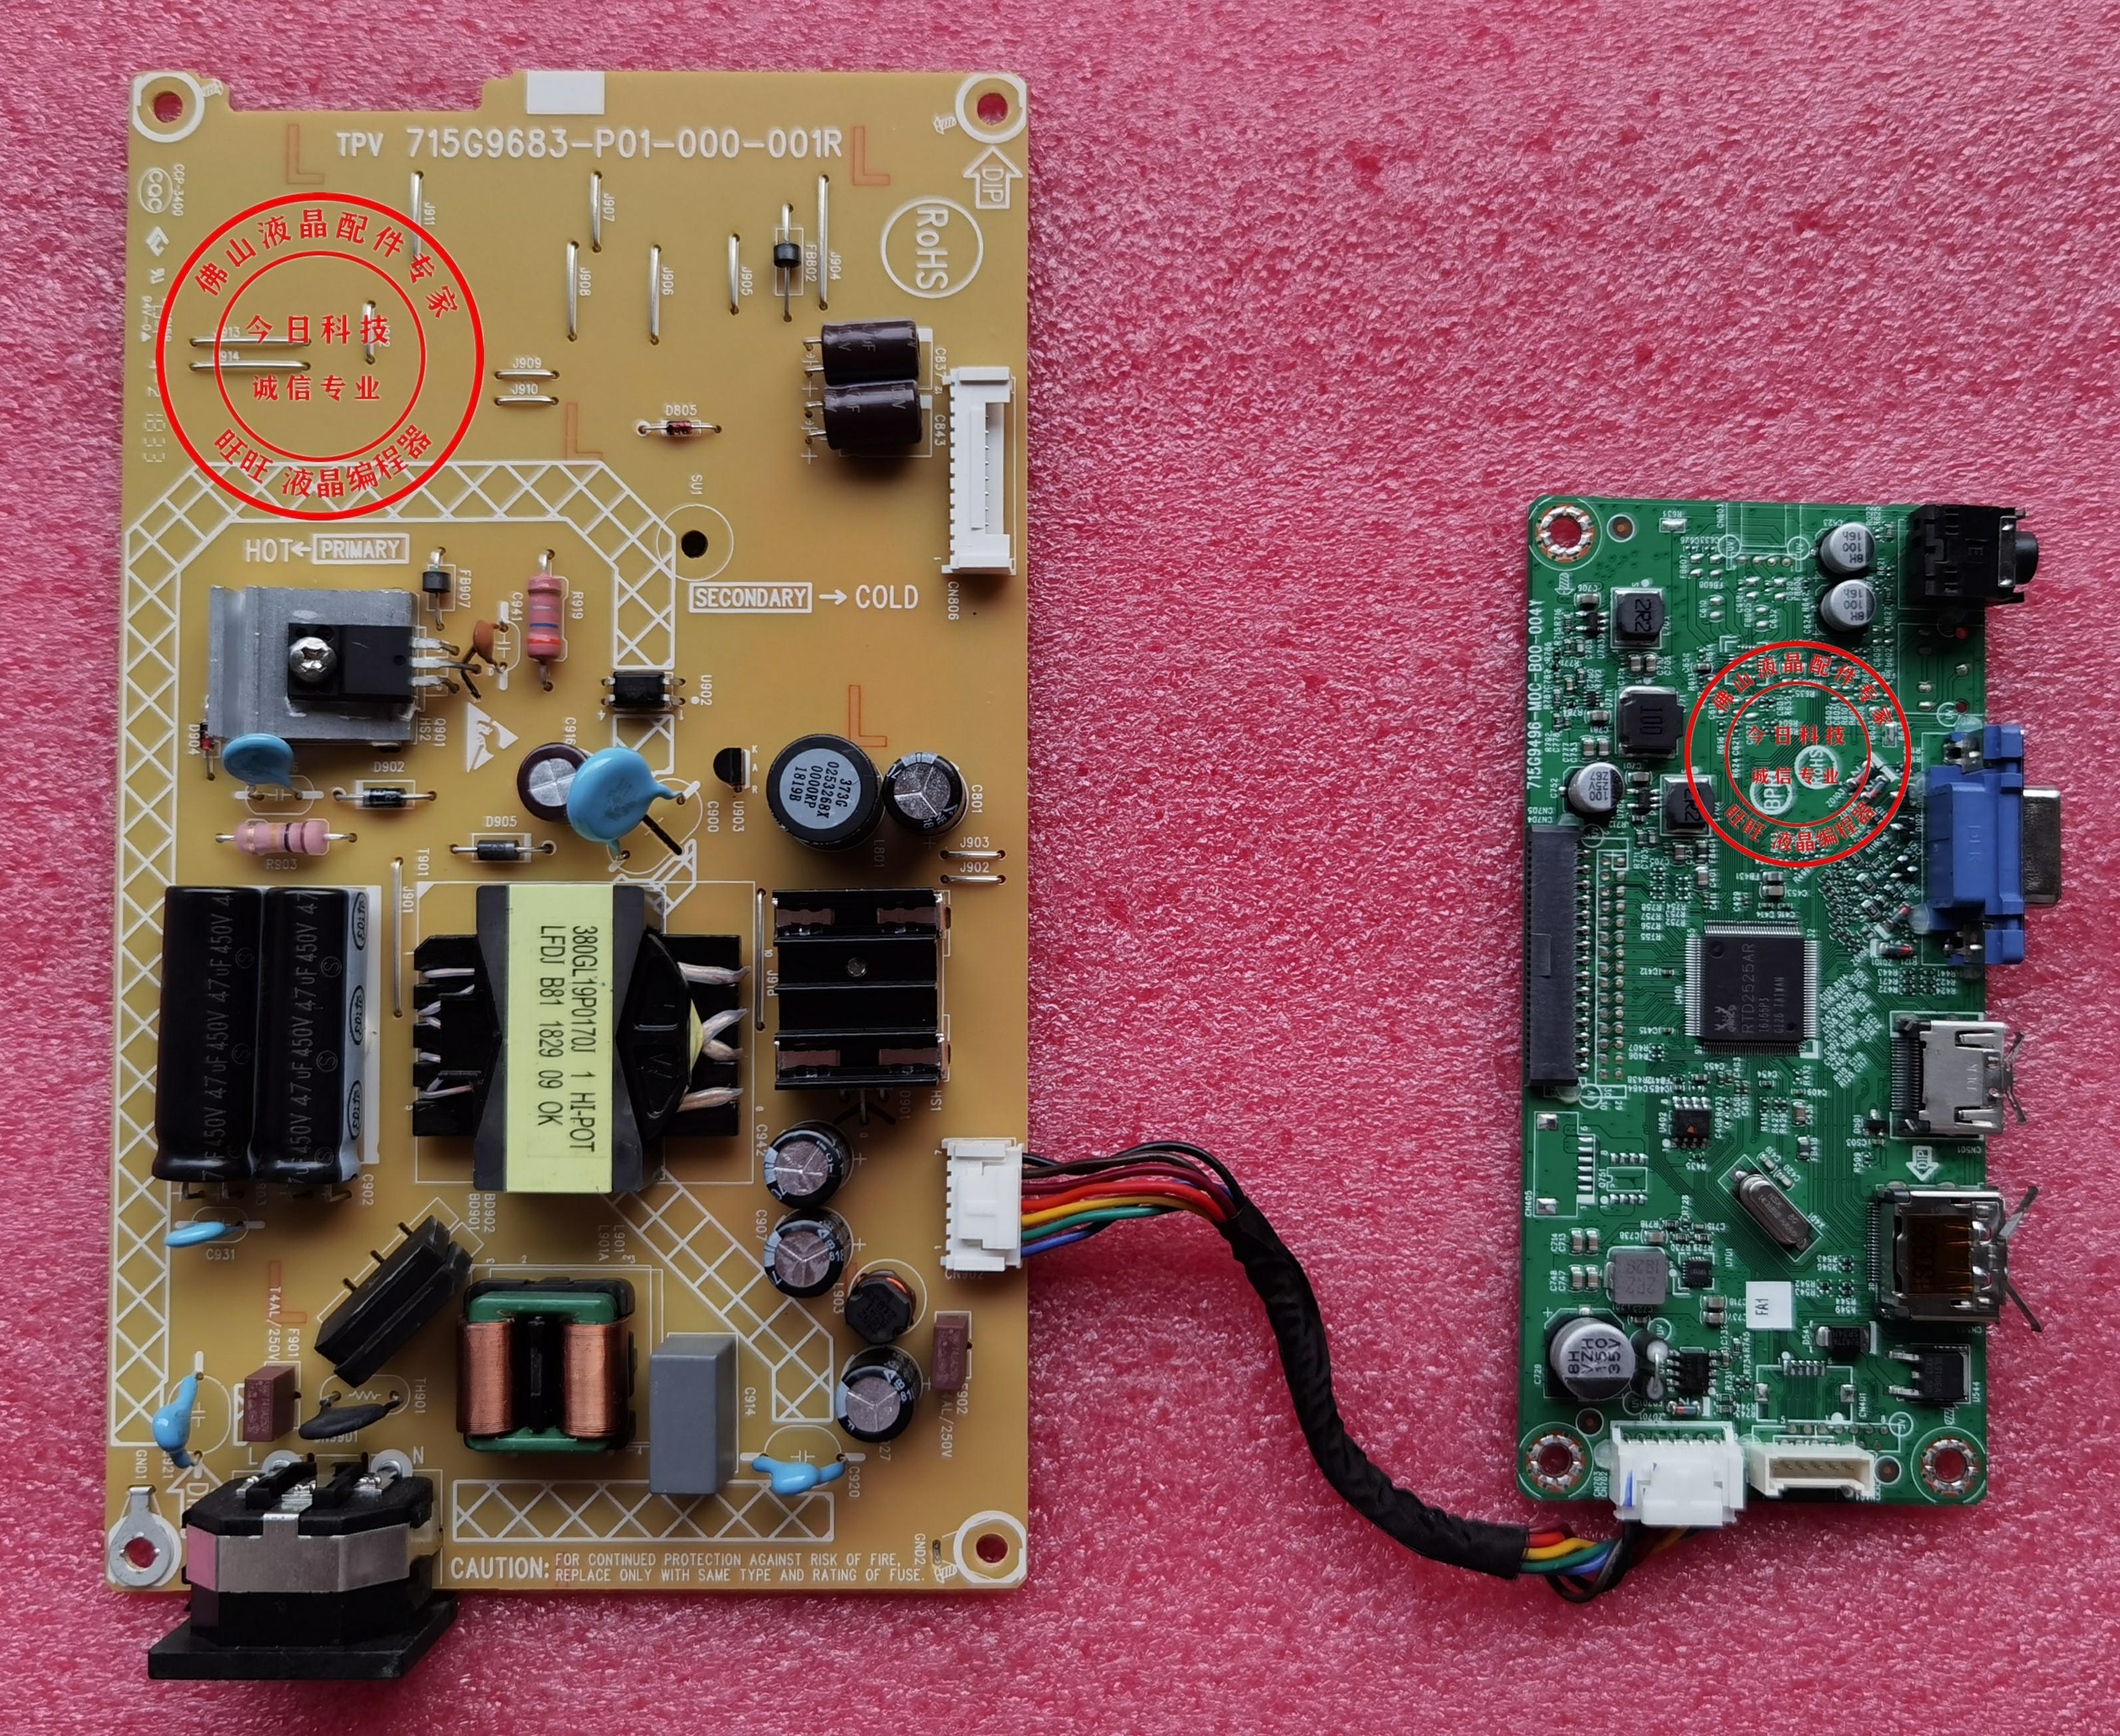 冠捷AOC C27V1Q C32V1Q/WS驅動板715G9496-M0C 電源板715G9683